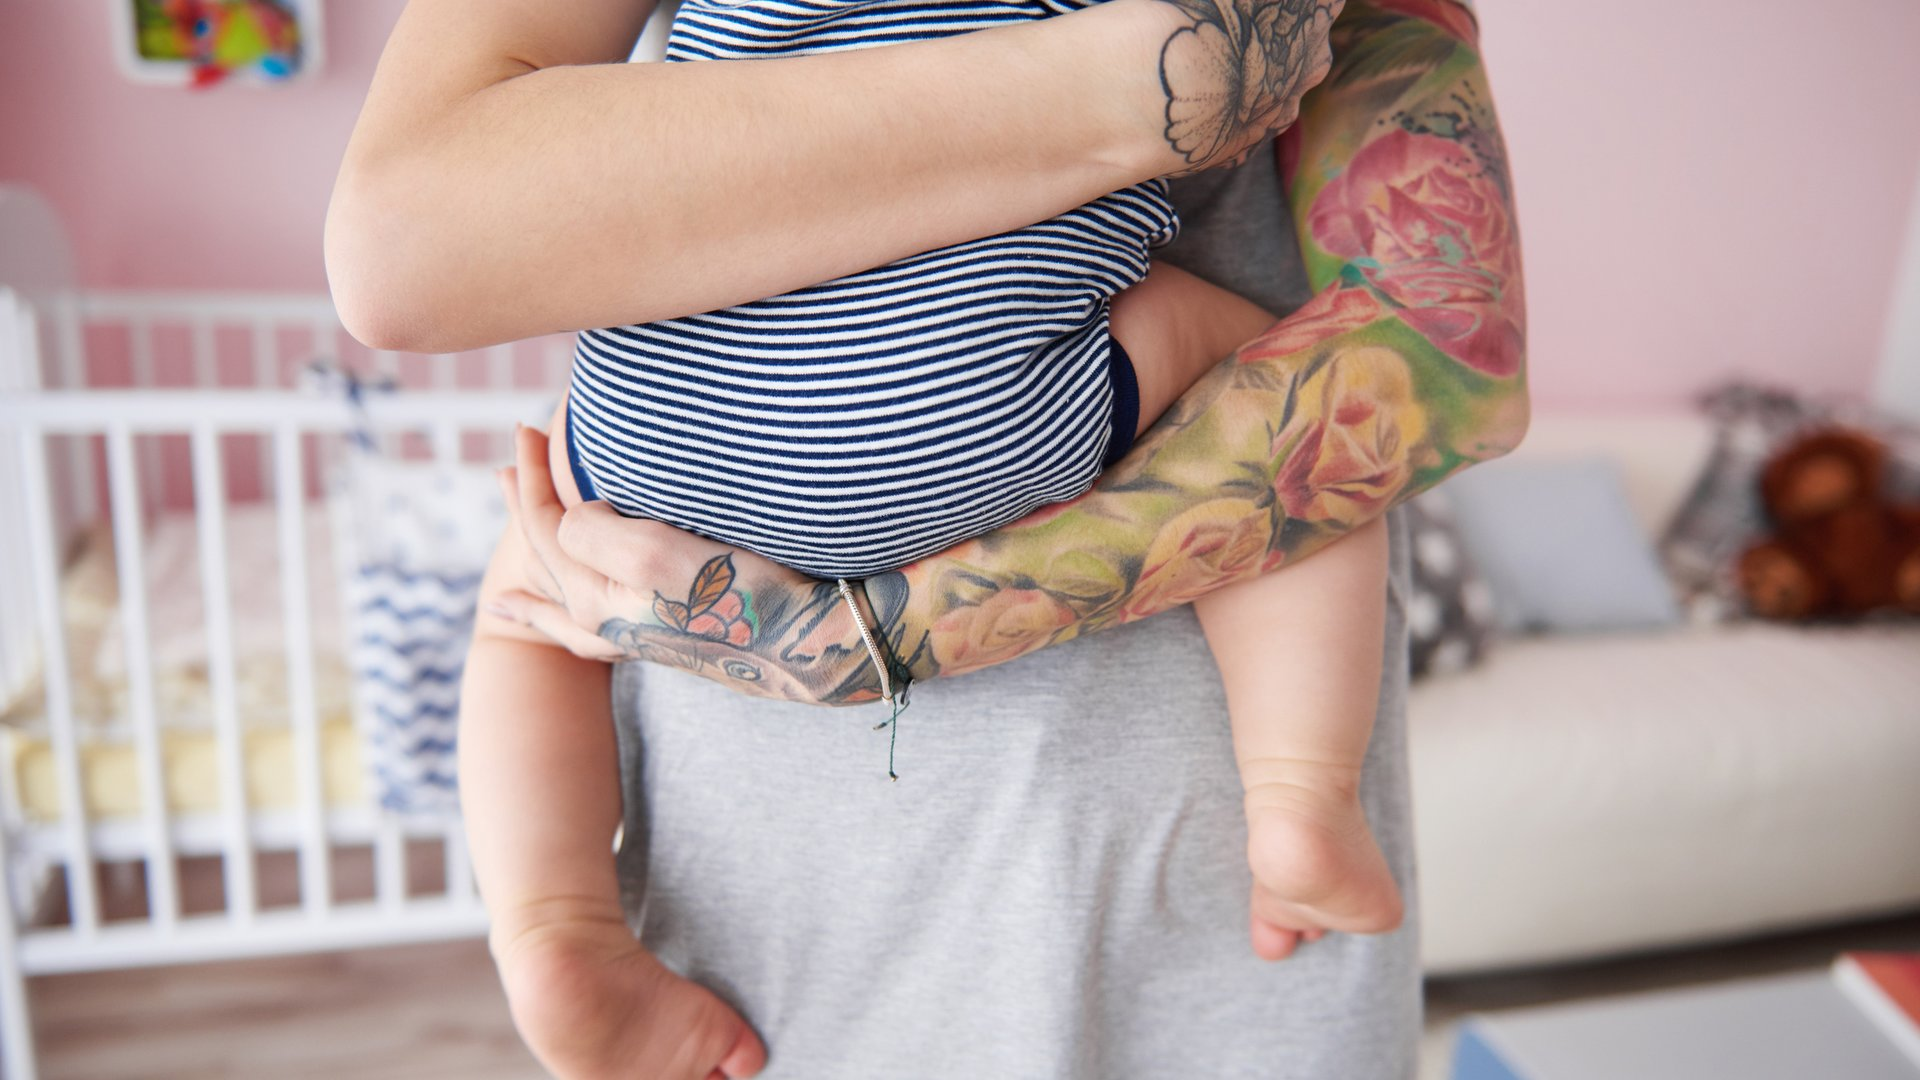 Oberschenkel mann tattoo 75 Tattoo